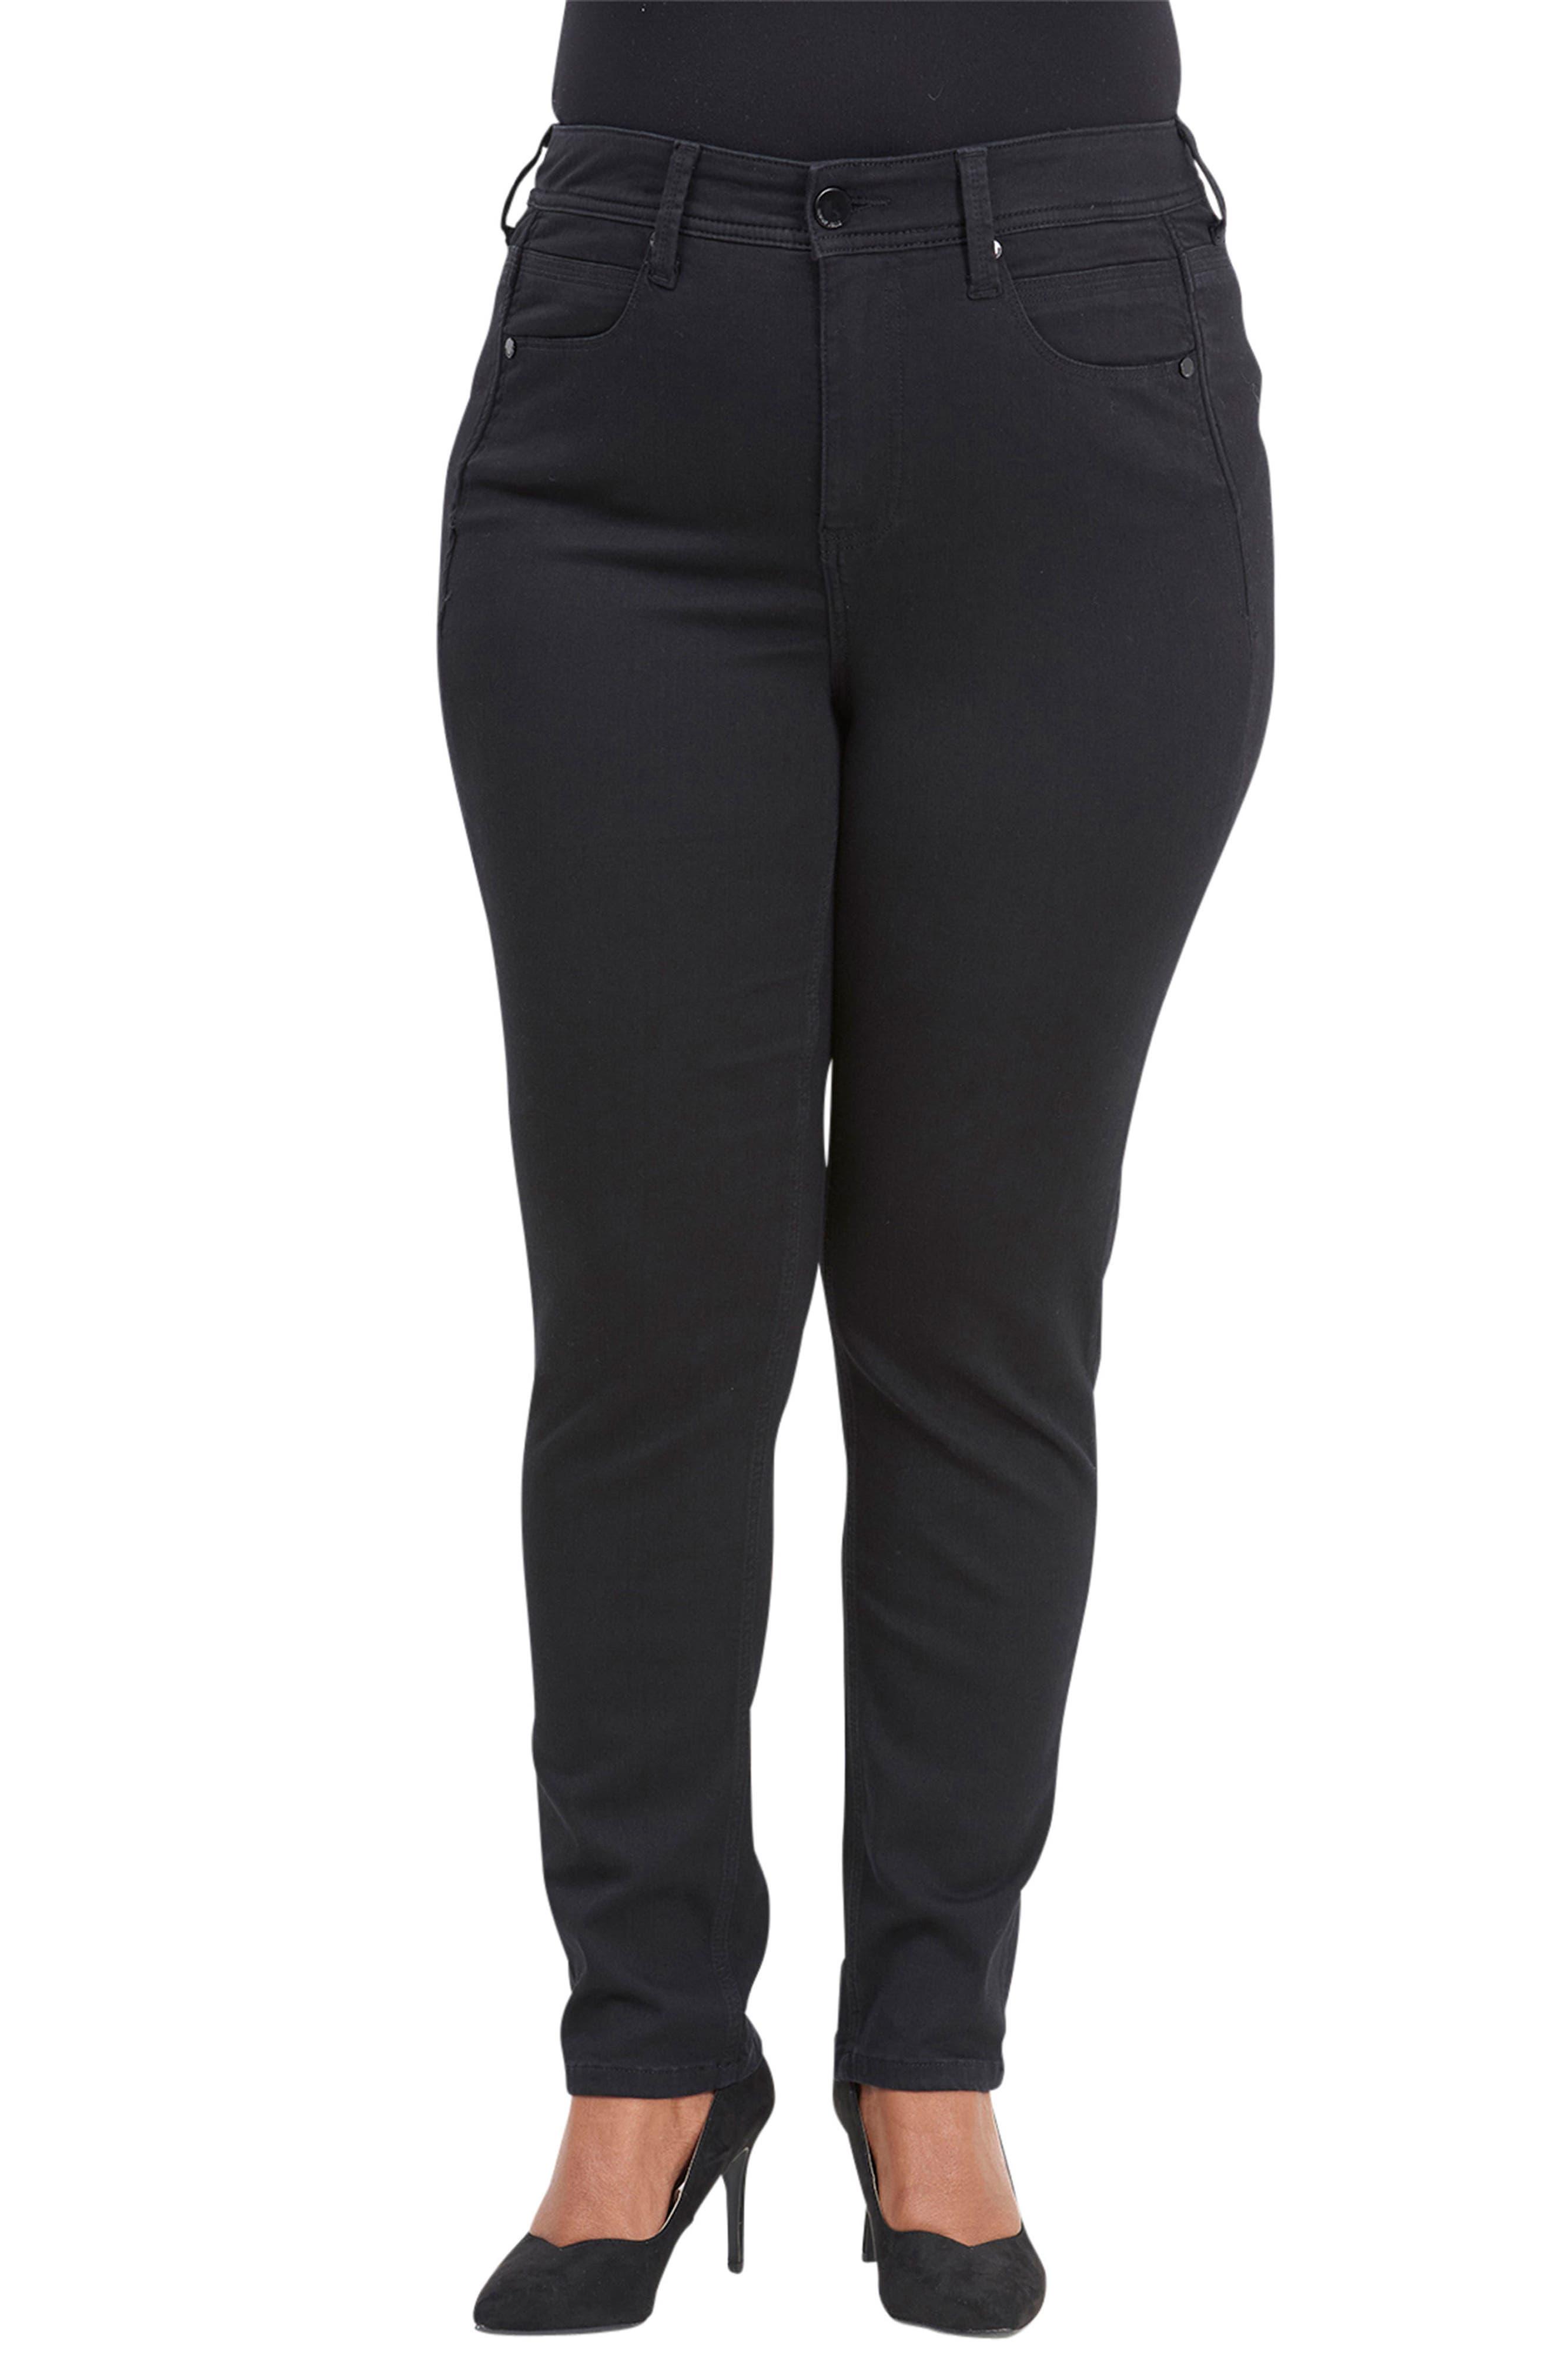 Plus Women's Seven7 Tummyless High Rise Skinny Jeans